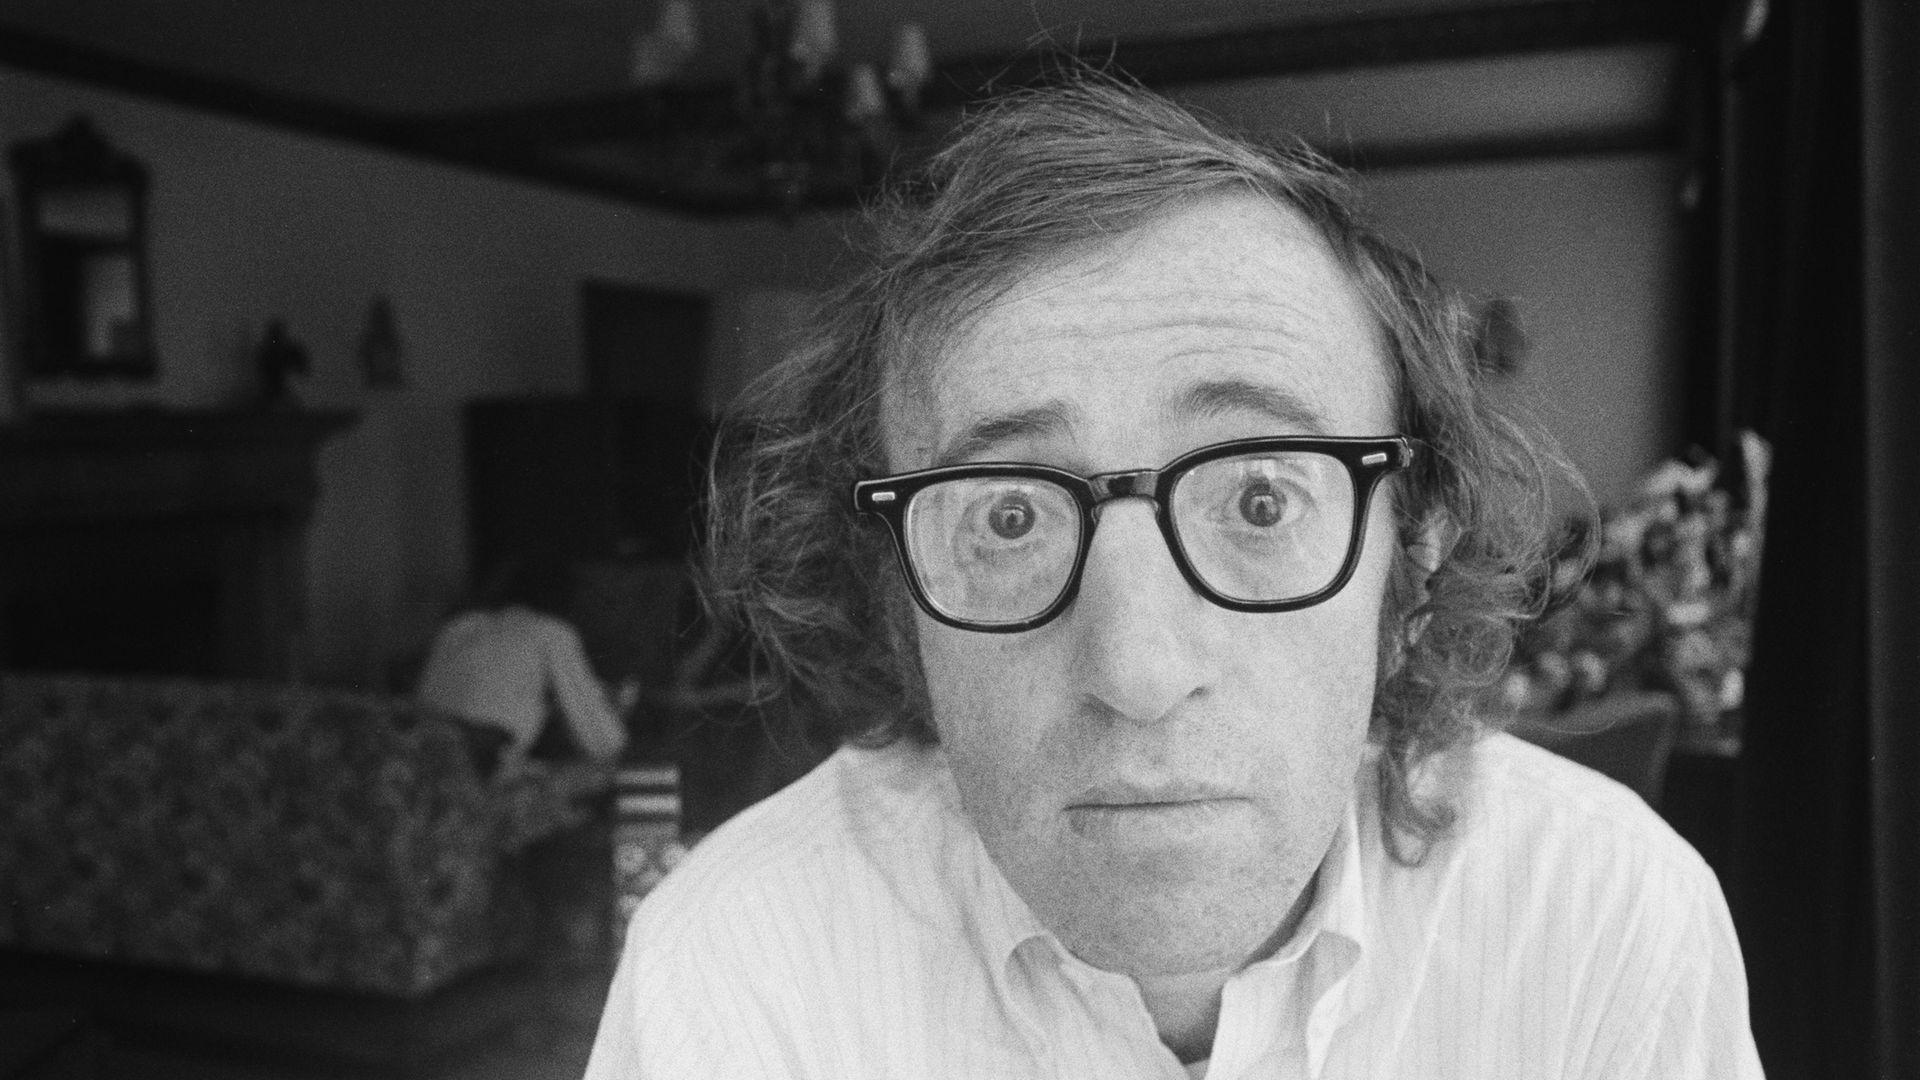 Woody Allen, in 1971 - Credit: Getty Images